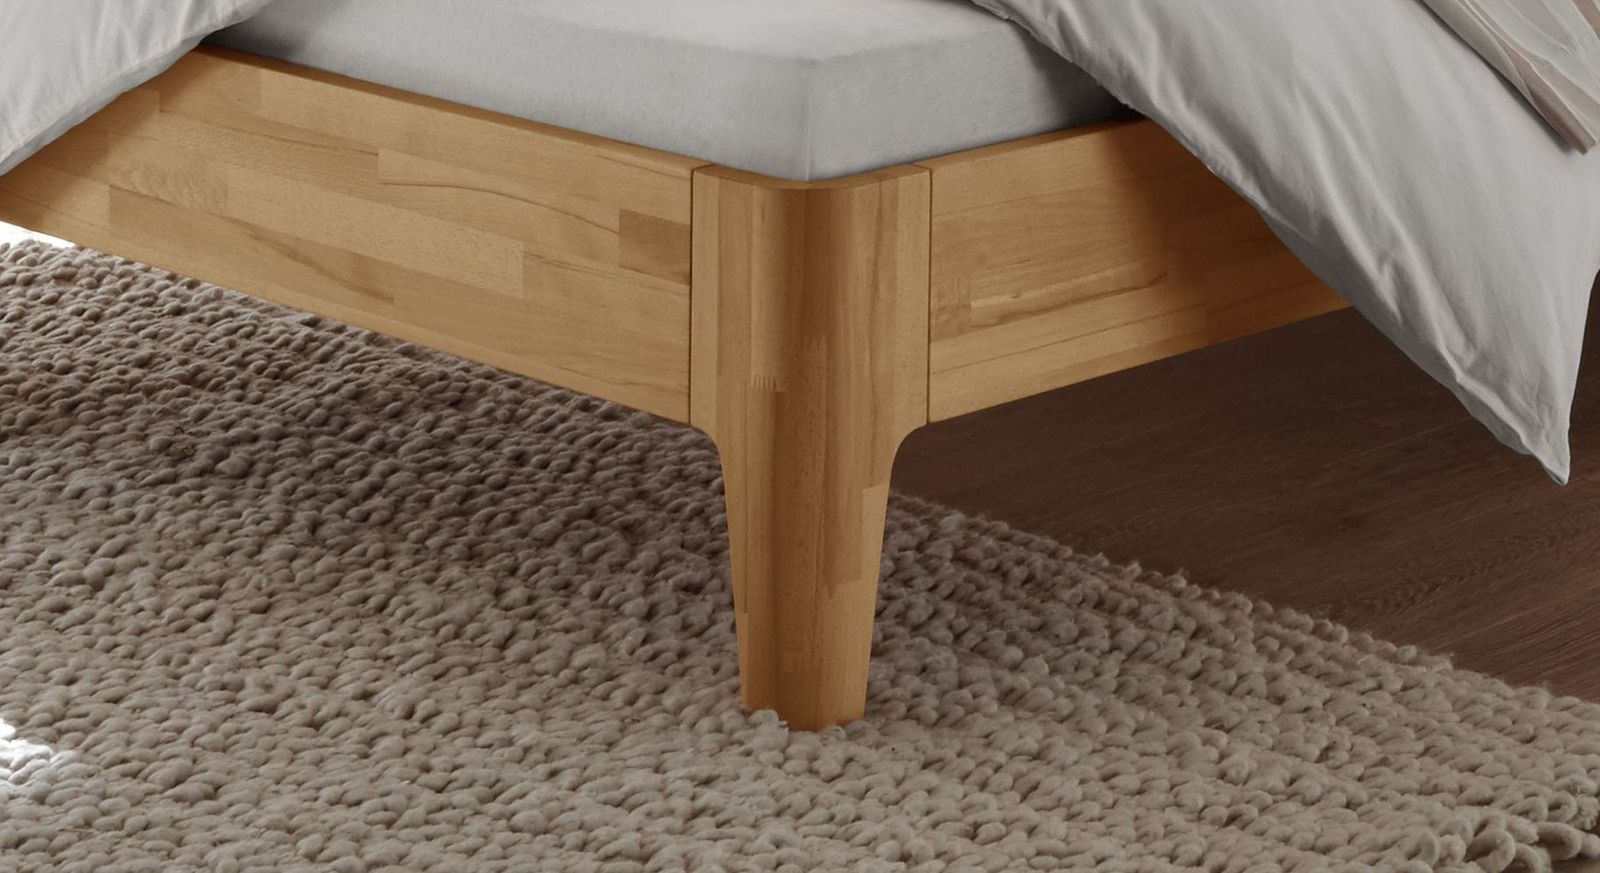 Bett Florina mit stabilen Holzfüßen